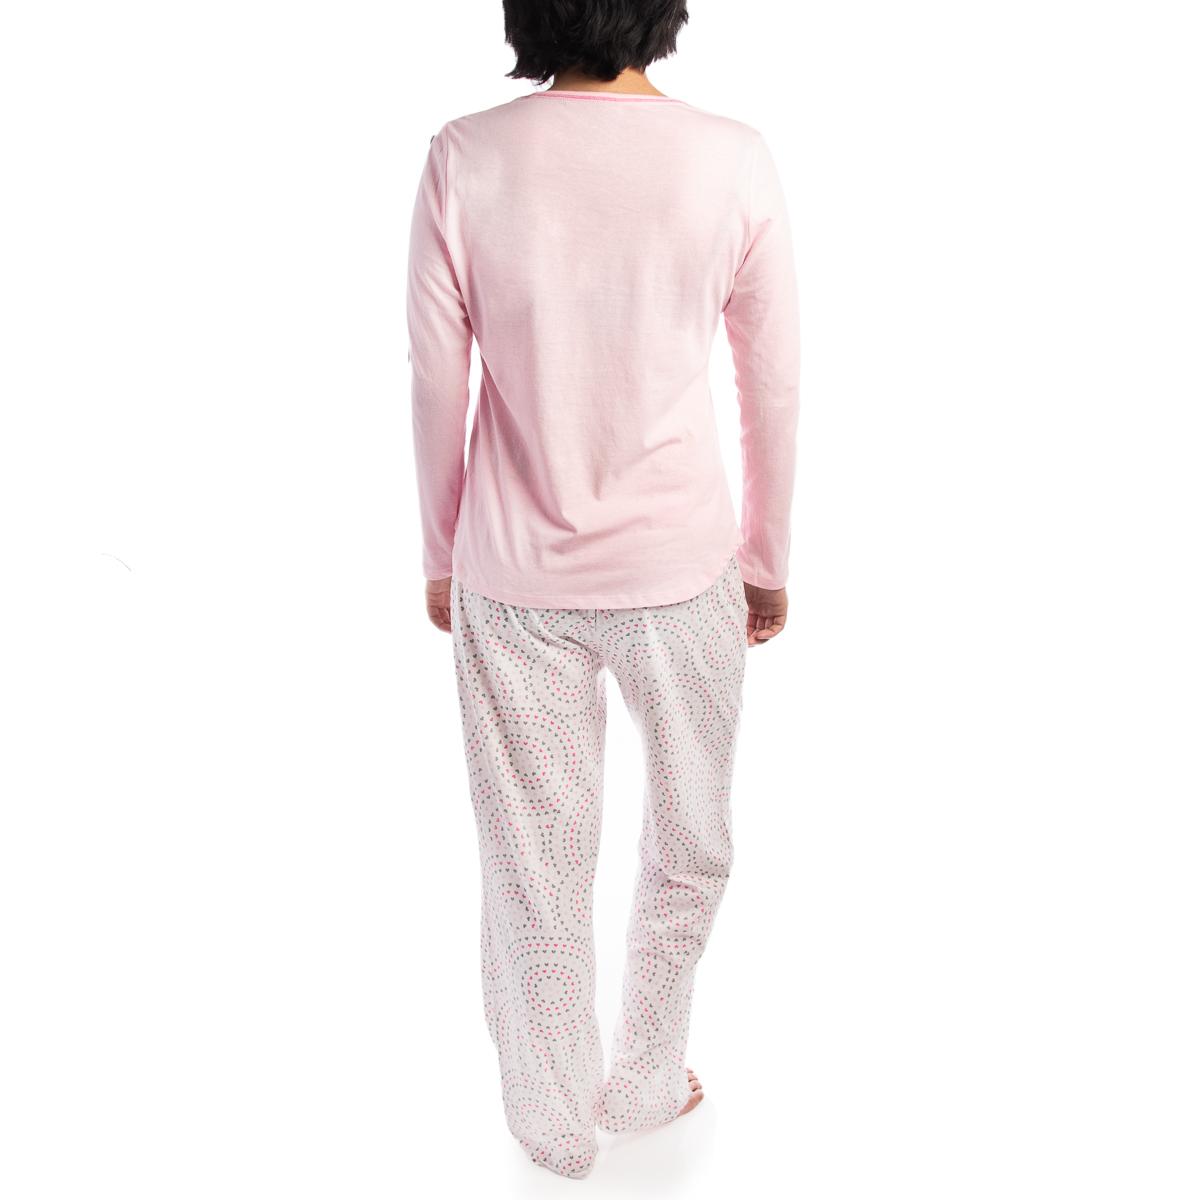 2-Piece-Jockey-Cotton-Pajamas-For-Women-Set-Long-Sleeve-Top-Bottom-PJs-Sleepwear thumbnail 12